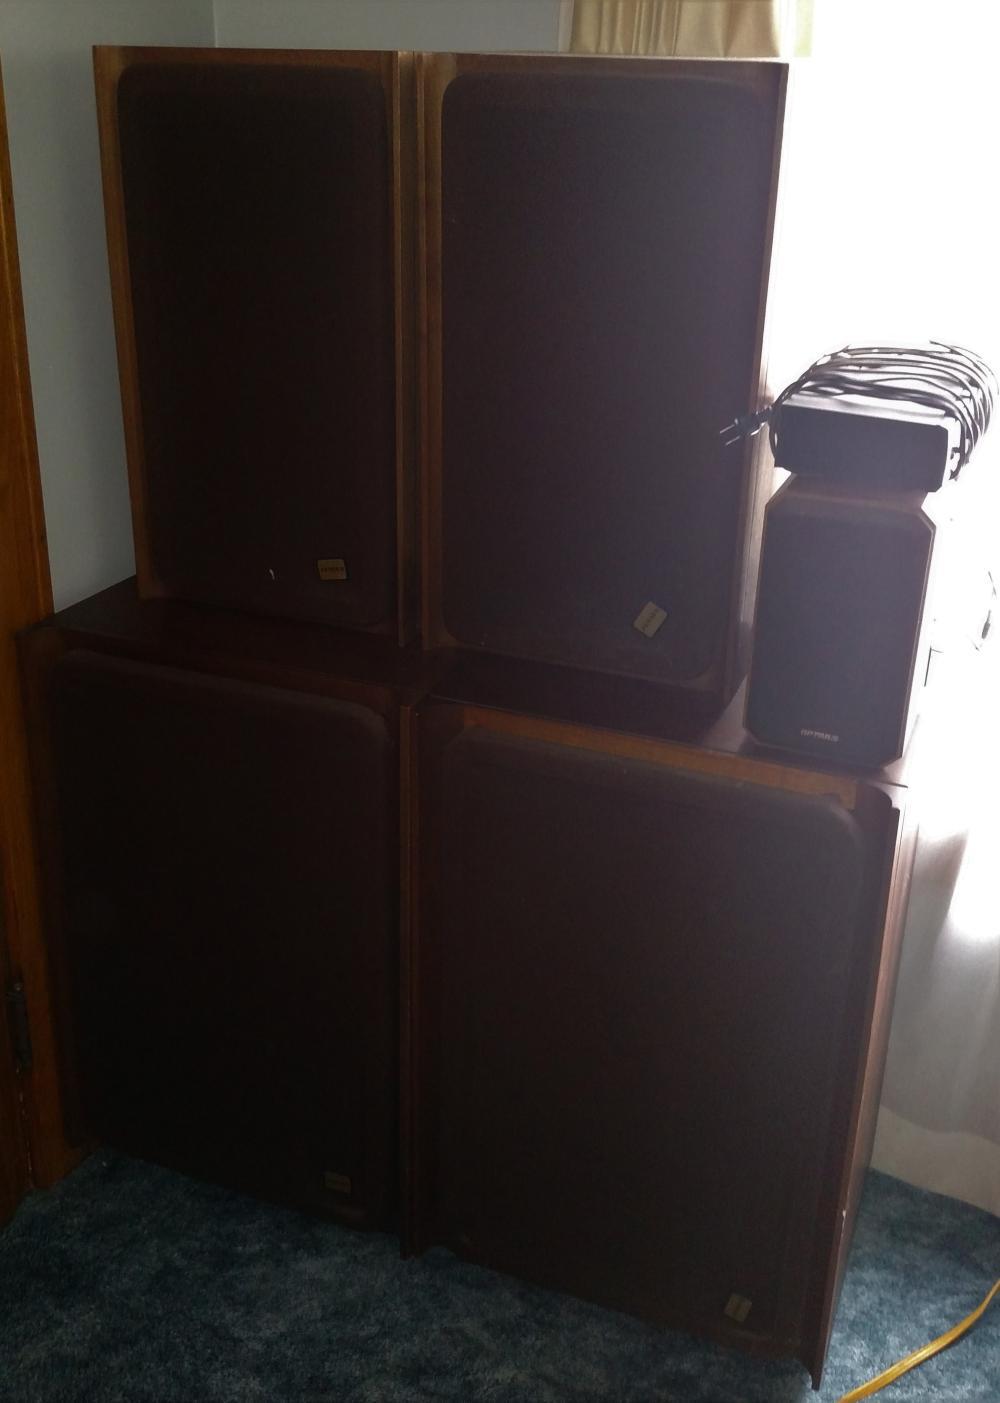 "4 gensen speakers, optimus integrated stereo amp, and 2 optimus speakers -- 31"" tall, 20"" wide, 16"" deep/ 25"" tall, 14"" wide, 12"" deep"